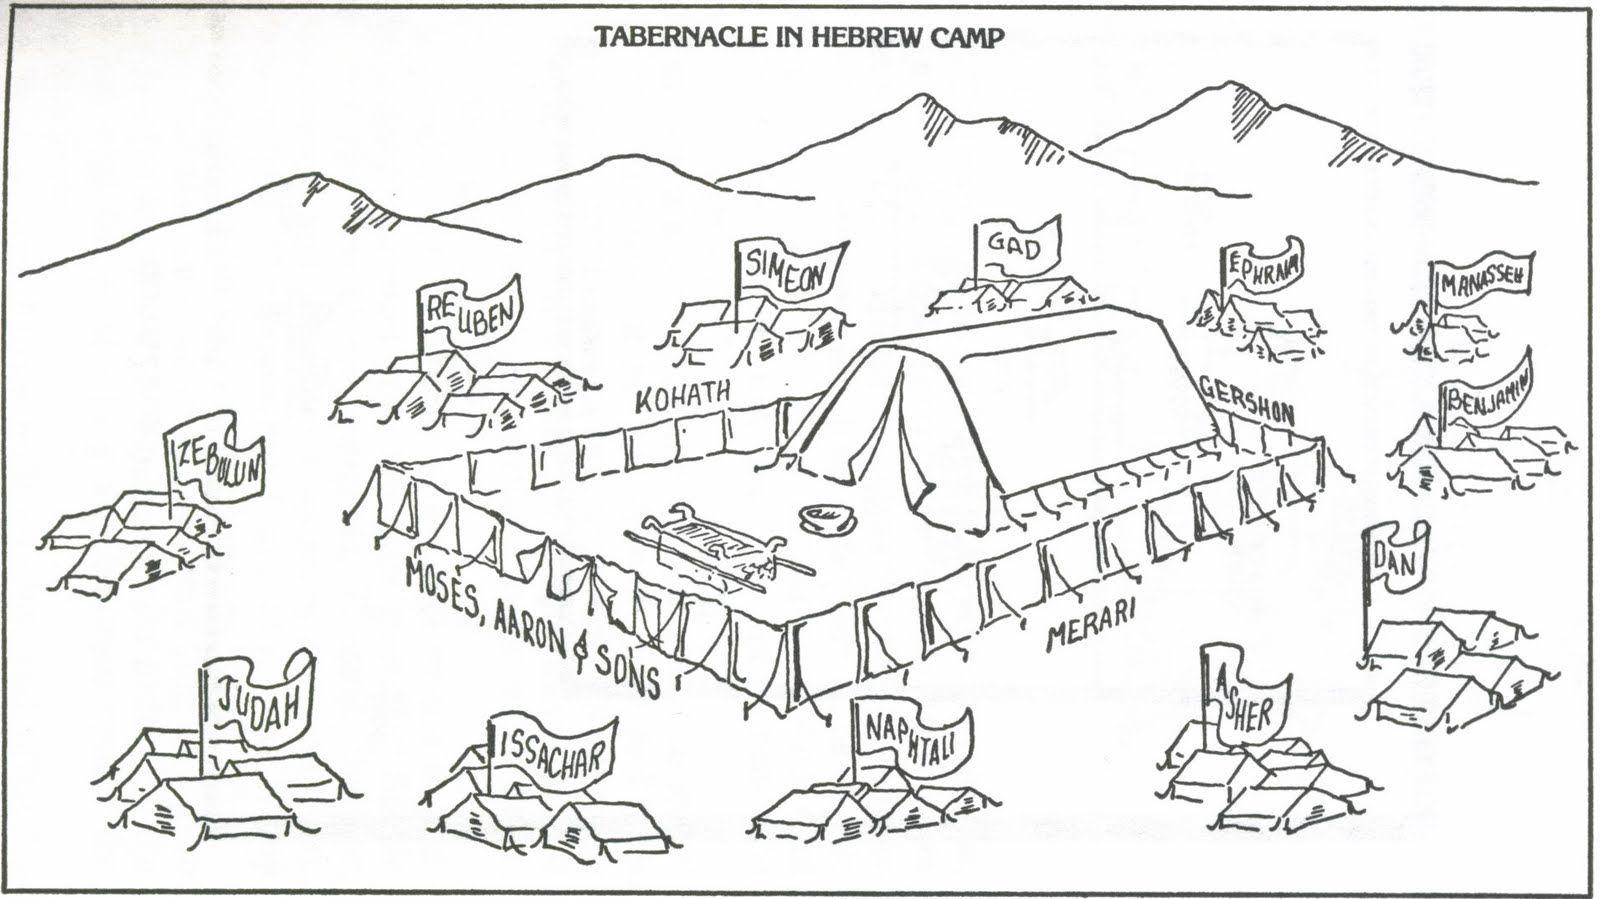 Tabernacle Coloring Page Free | Wonder Kids - Week 5: Ten - Free Printable Pictures Of The Tabernacle